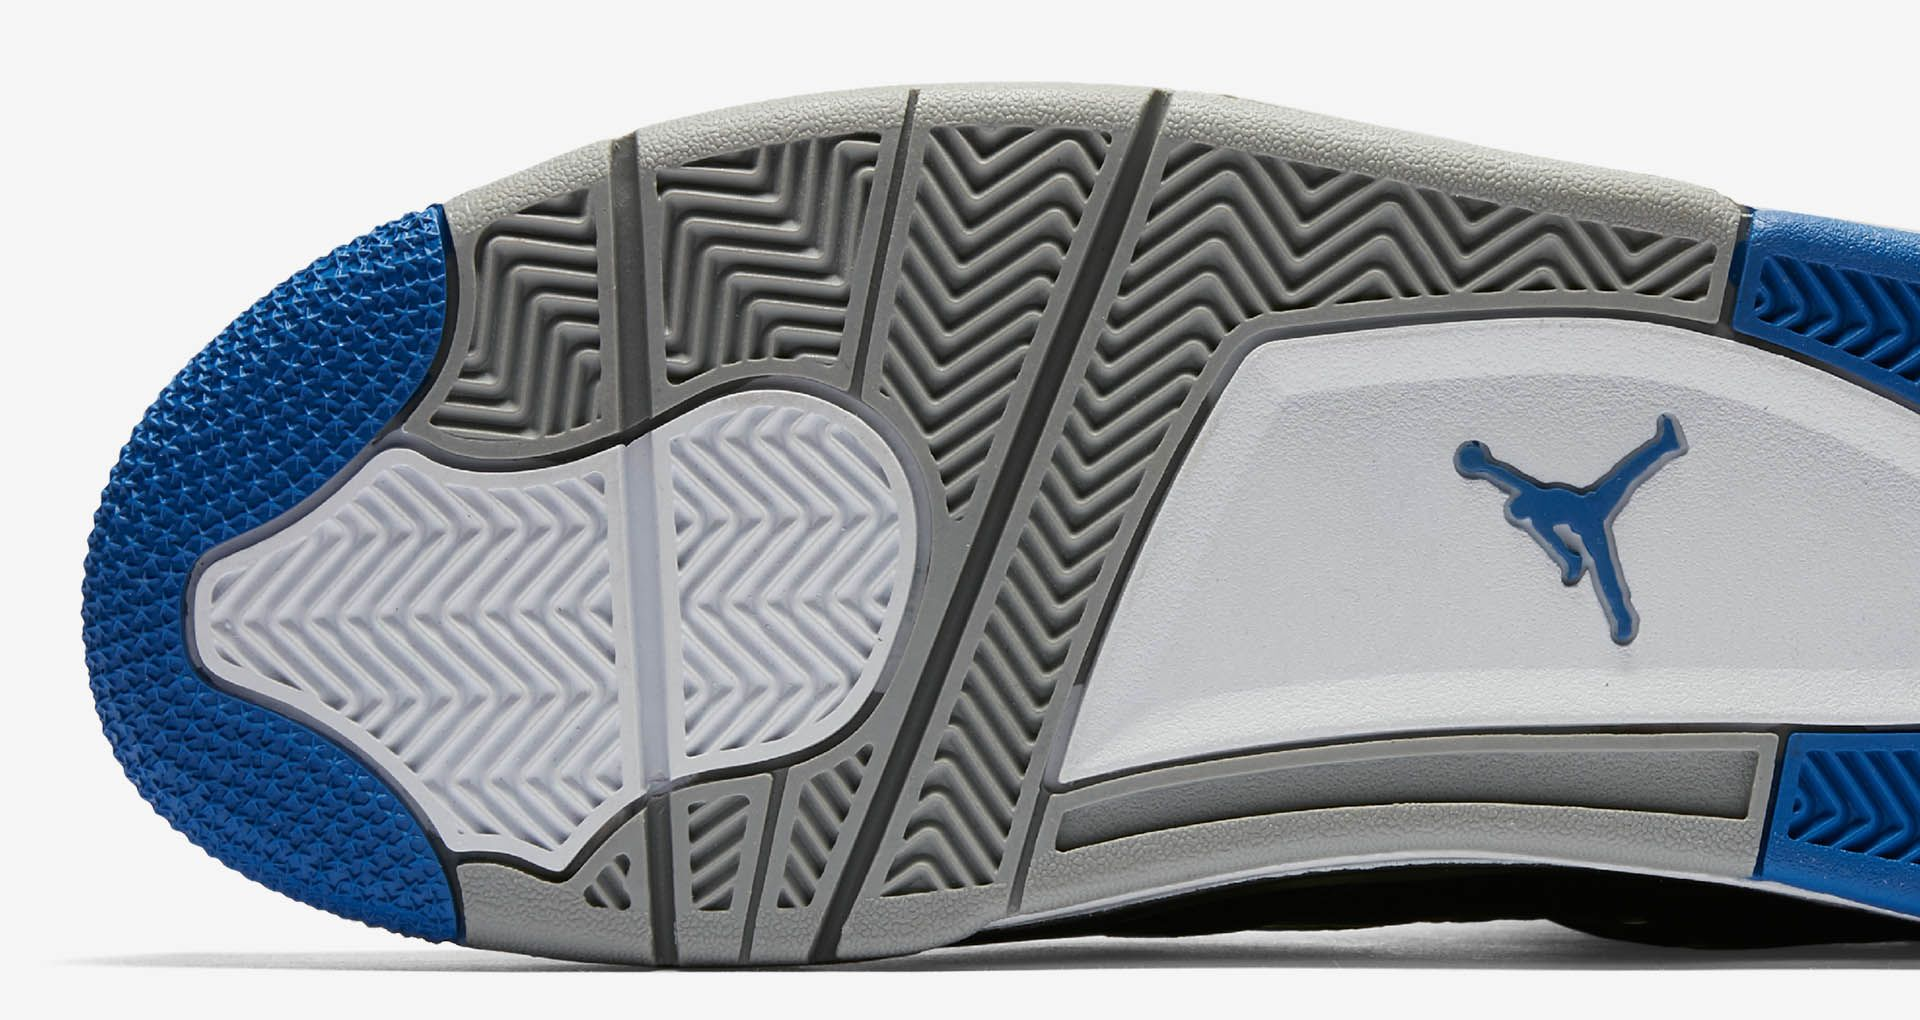 new style d8035 d4460 Air Jordan 4 Retro 'Motorsport Away' Release Date. Nike+ SNKRS